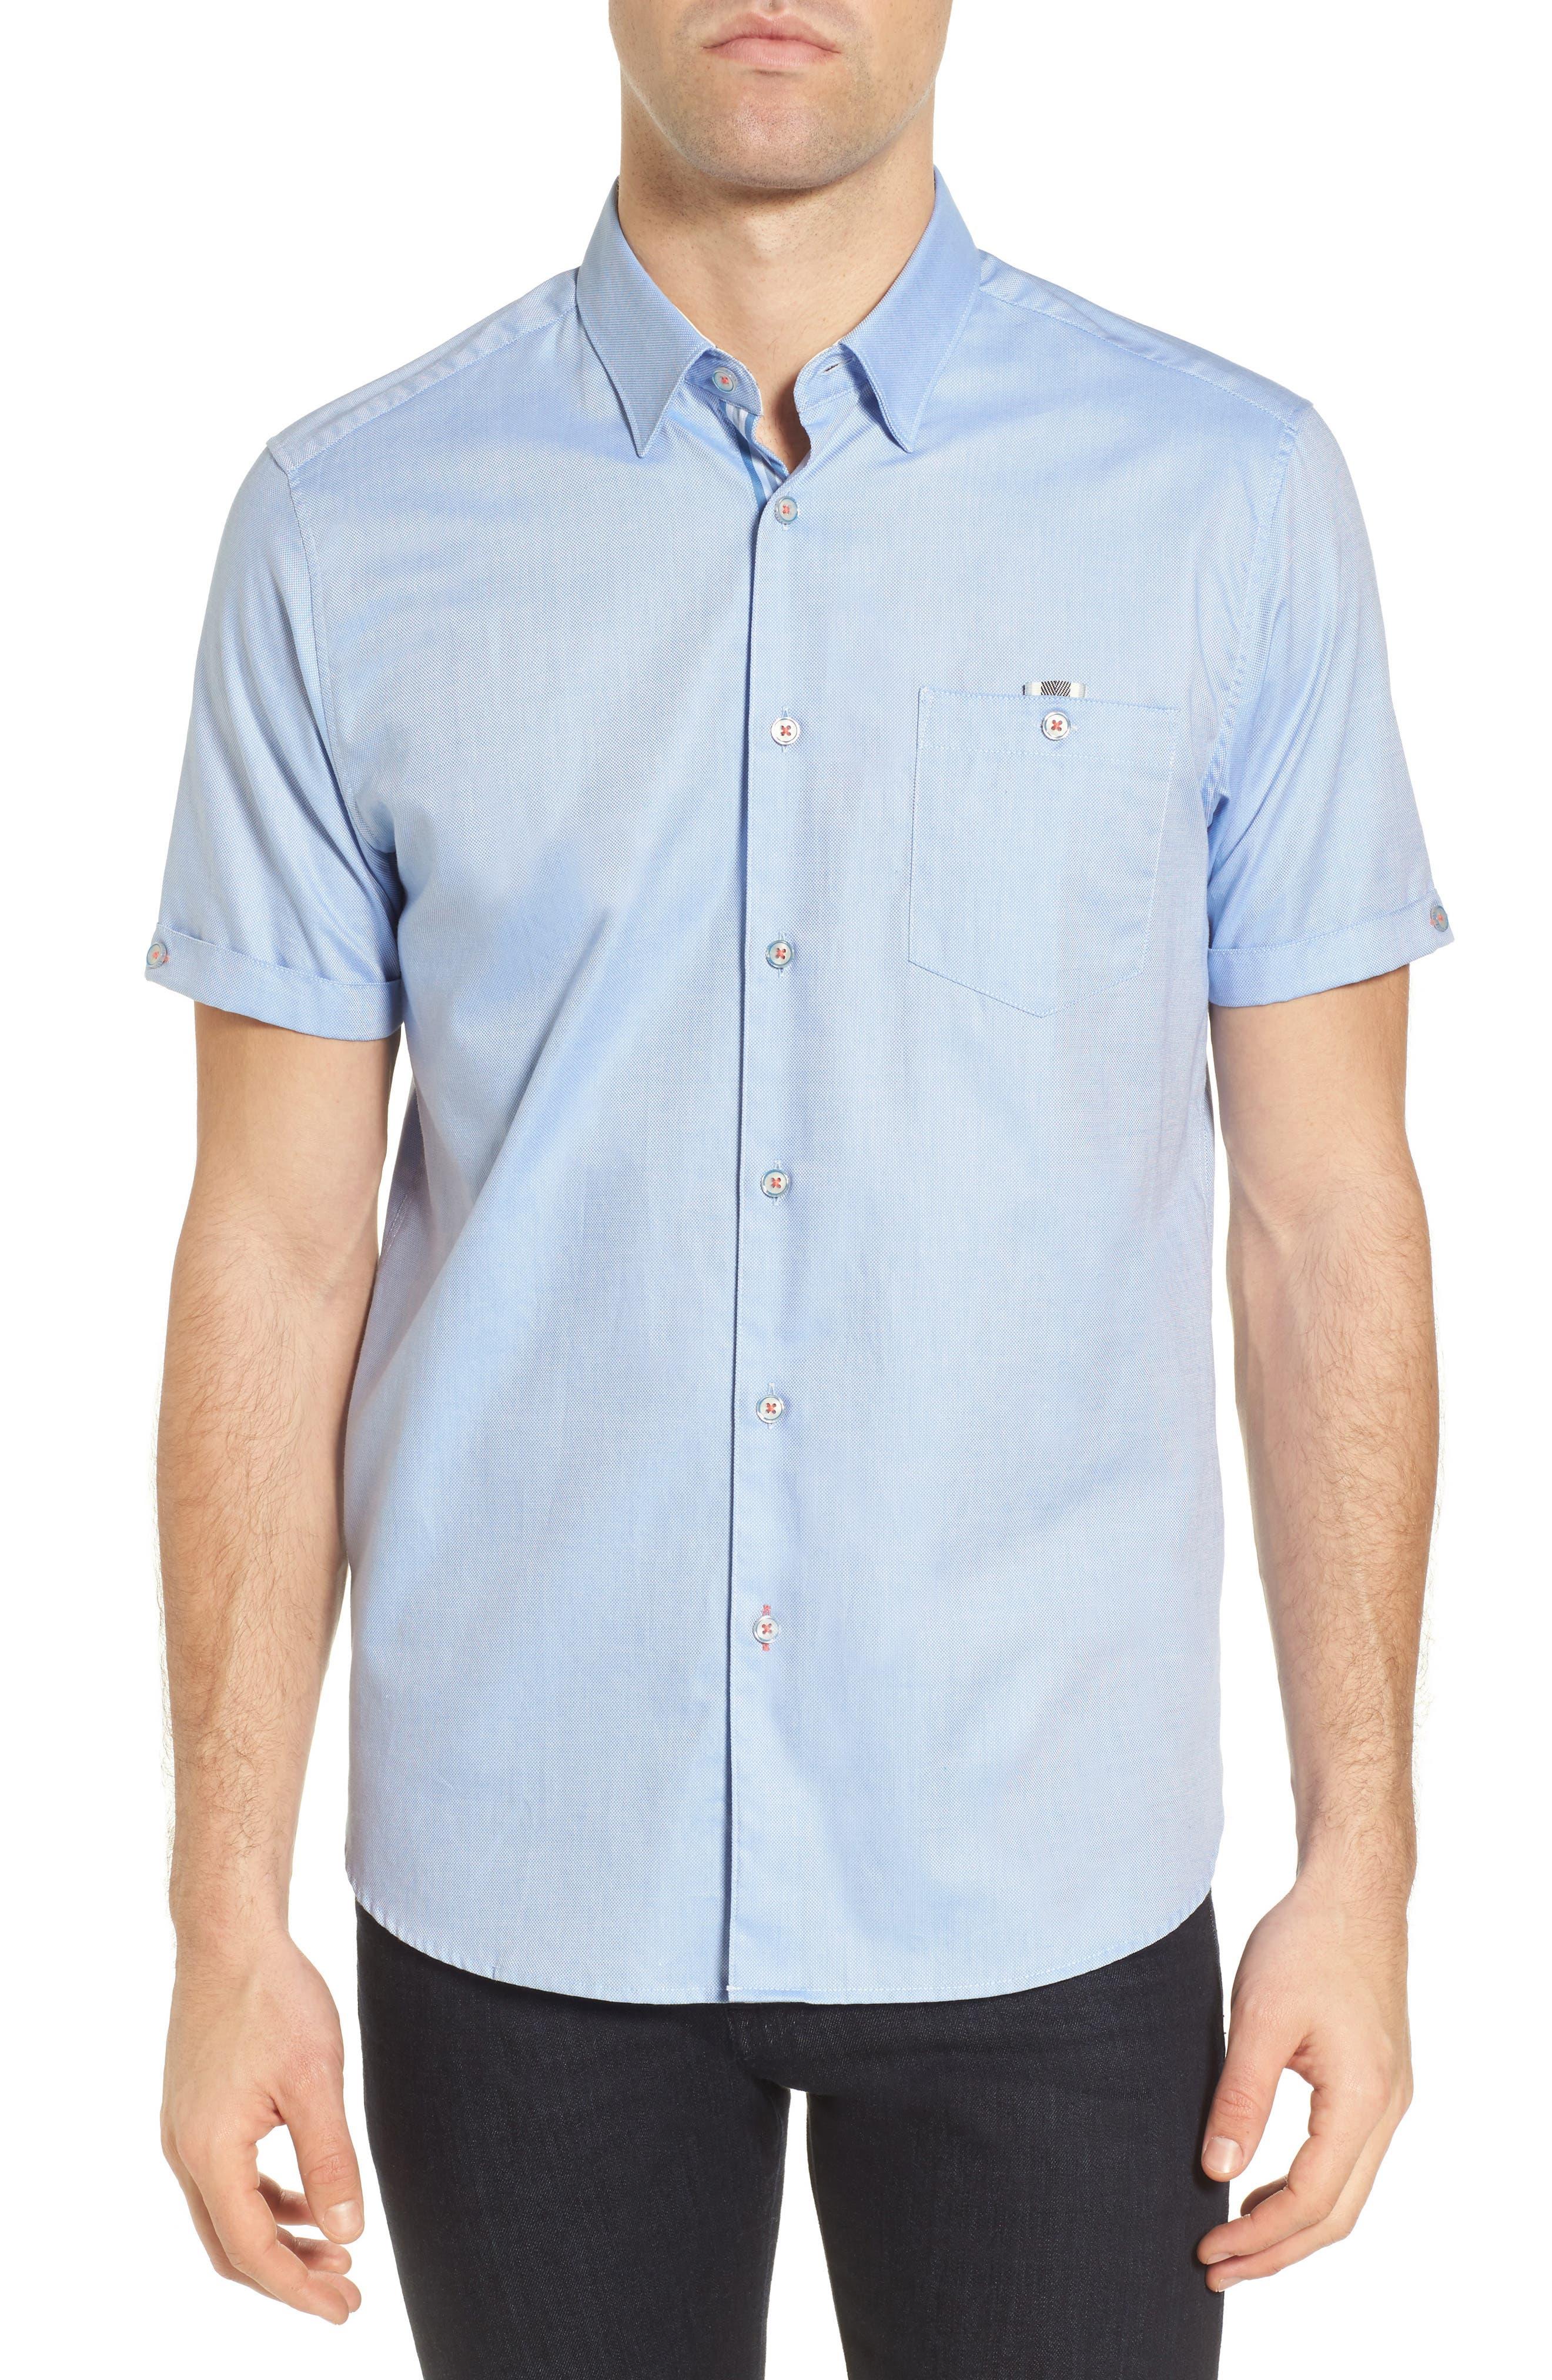 Wallott Extra Slim Fit Short Sleeve Sport Shirt,                             Main thumbnail 1, color,                             Blue